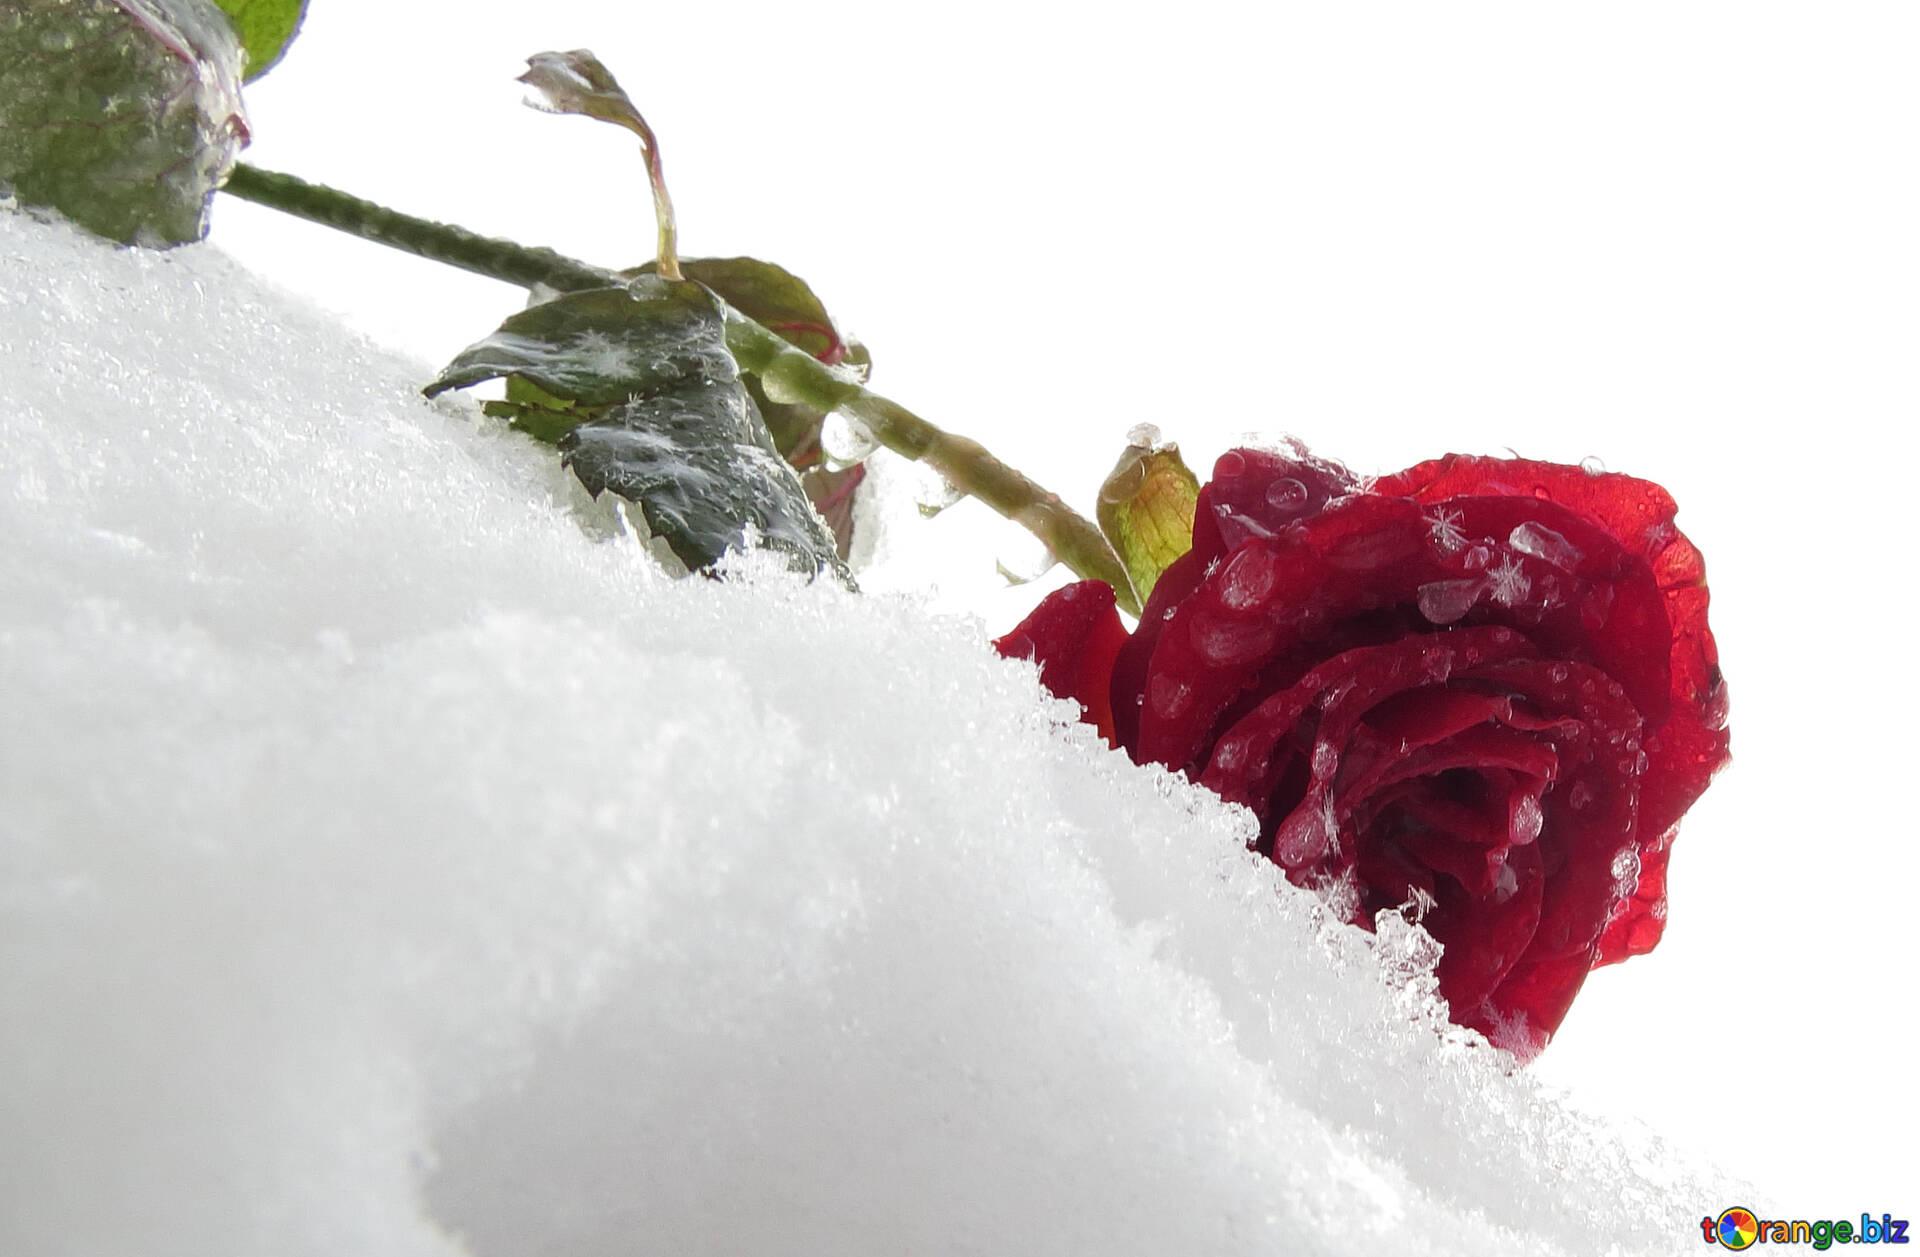 Анимашки грусти, открытка розы на снегу со словами